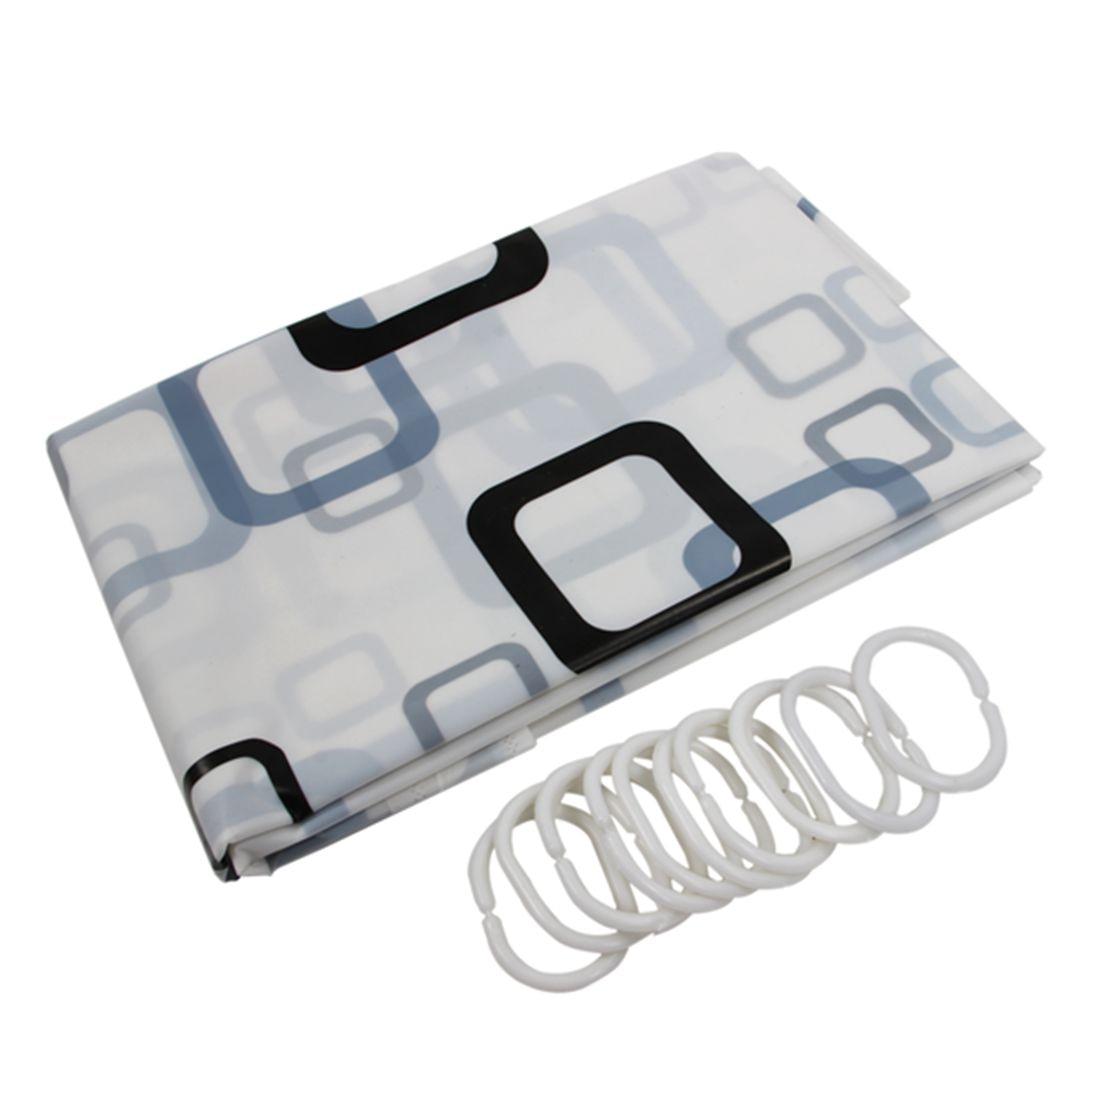 180cm x 180 cm Black White Square Bathroom Waterproof Fabric Bath Shower Curtain